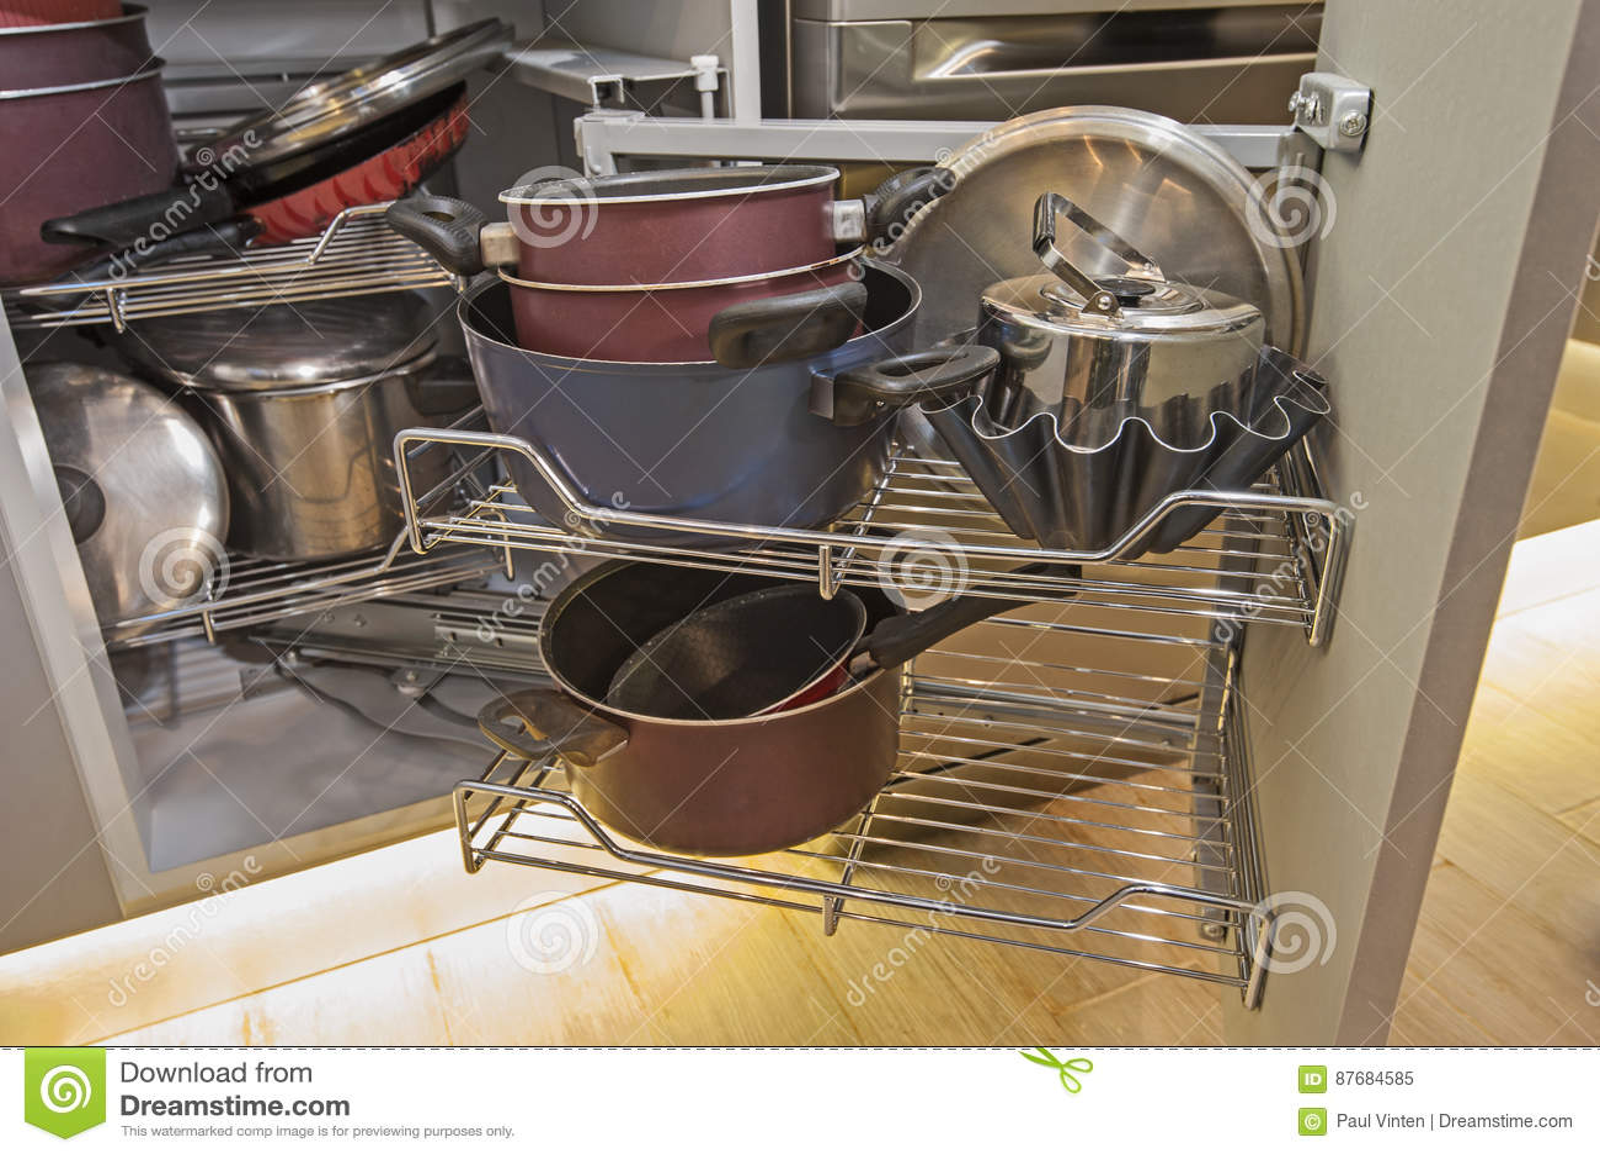 kitchen shelf decor cabinet cost 厨房室内设计角落碗柜细节库存图片 图片包括有架子 装饰 平底锅 机架 厨房室内设计装饰显示壁角碗柜的特写镜头细节有摇摆的架子和平底深锅的豪华公寓的